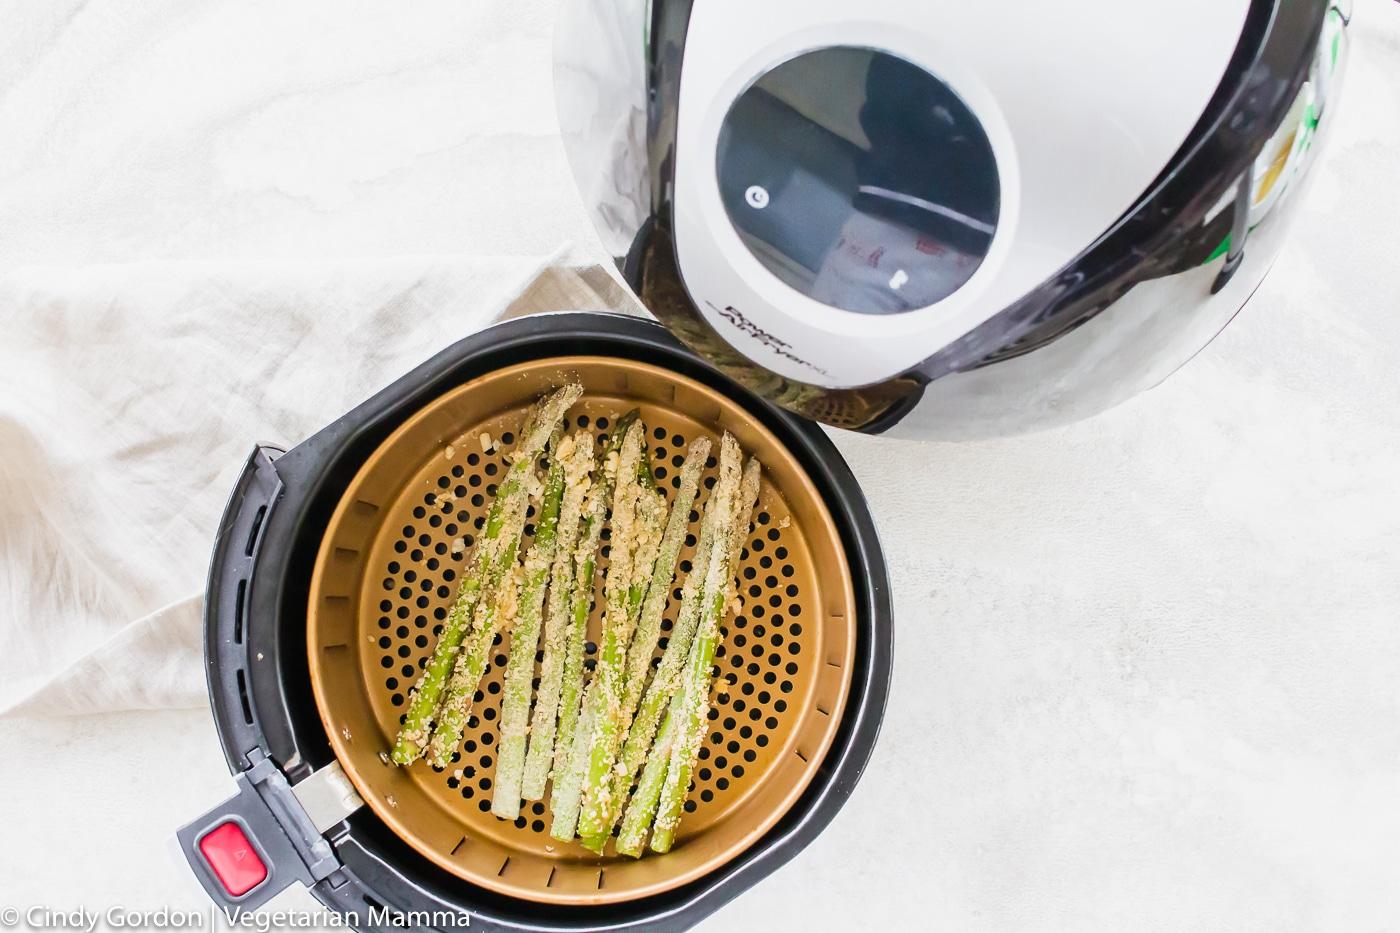 Crispy Asparagus in Air Fryer